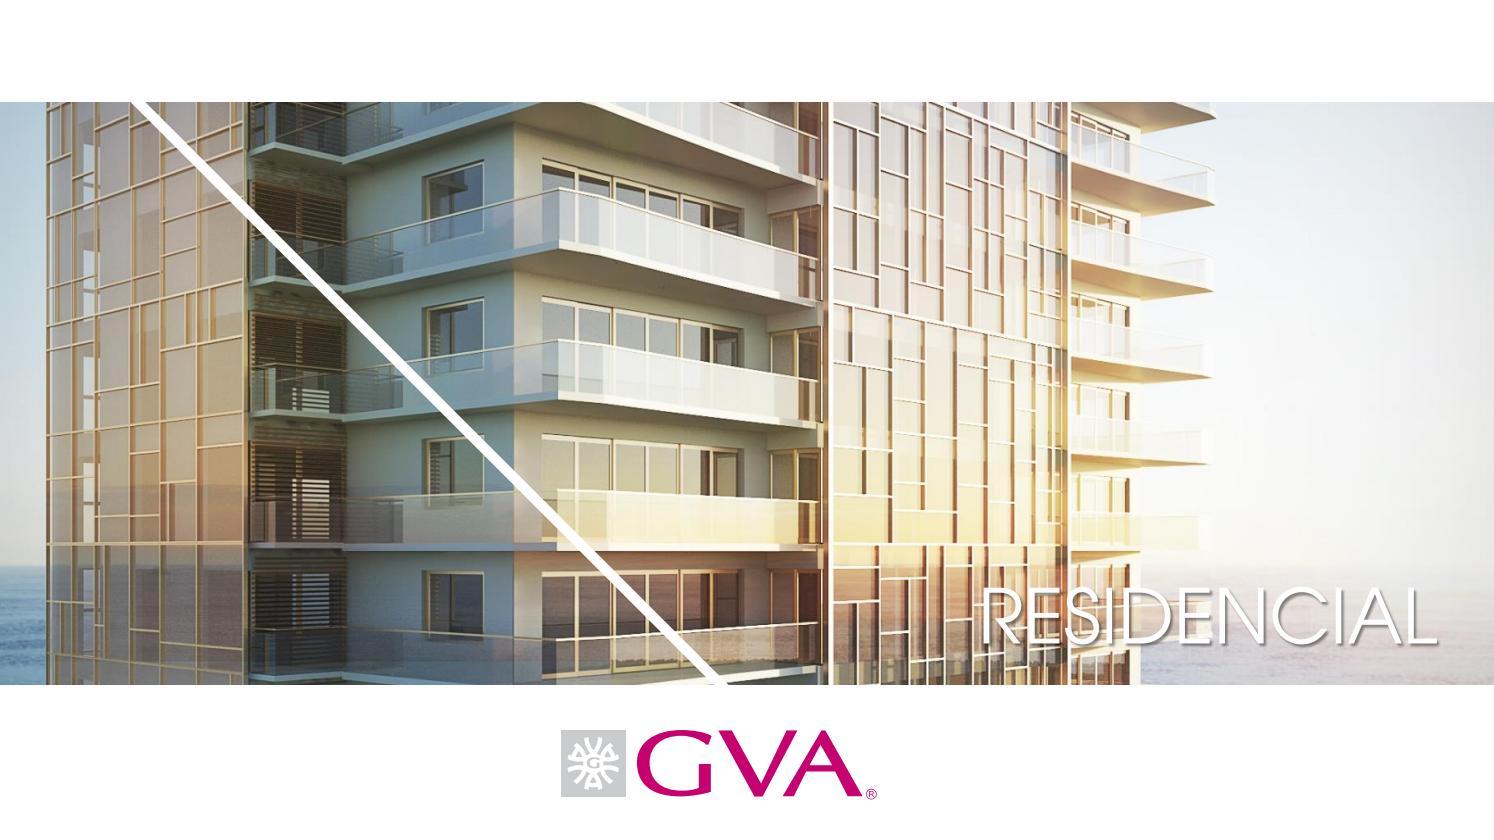 Gva residencial by gva arquitectos issuu - Gva arquitectos ...